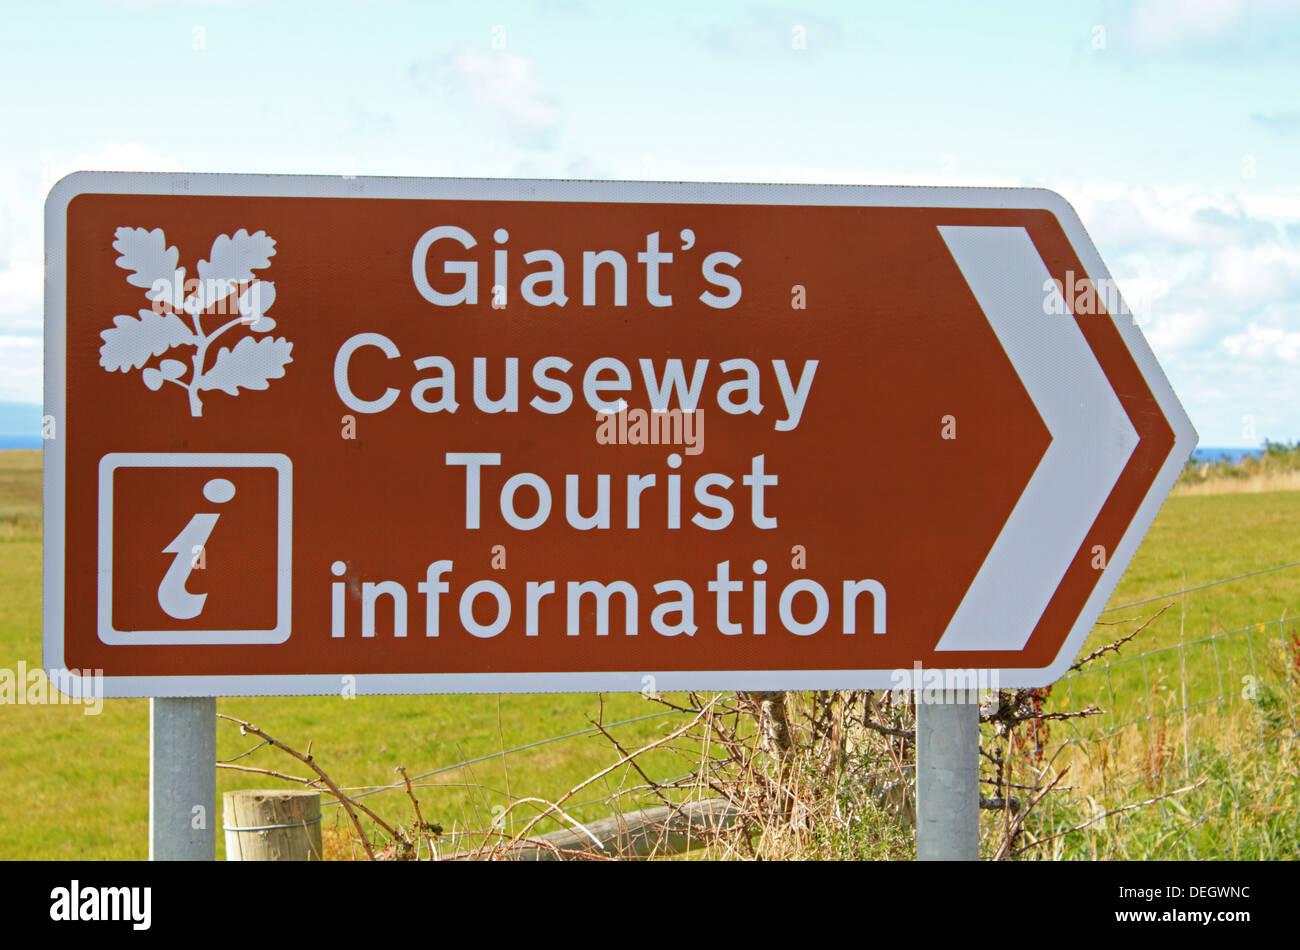 Giant's Causeway near Bushmills, Antrim, Northern Ireland, UK. - Stock Image